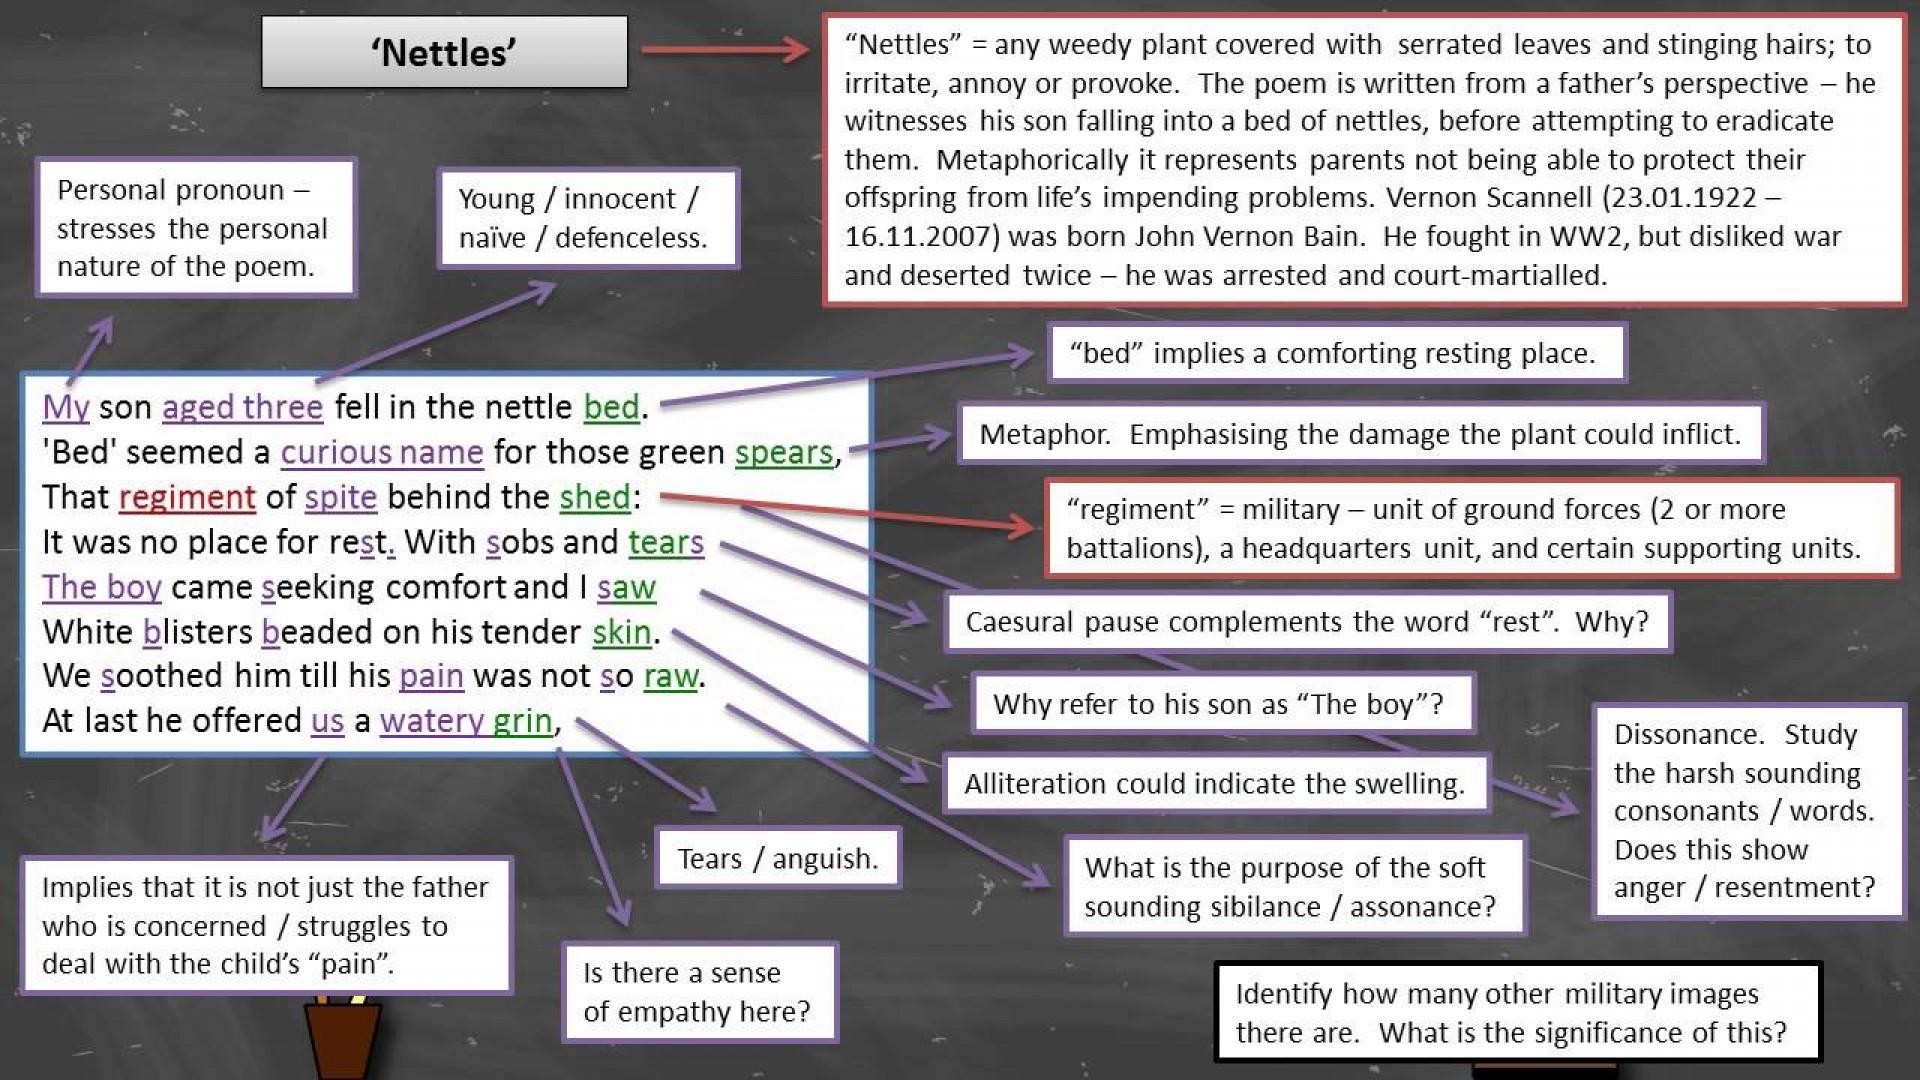 001 Maxresdefault Essay Example Nettles Wonderful Poem Analysis Tall Annotated 1920